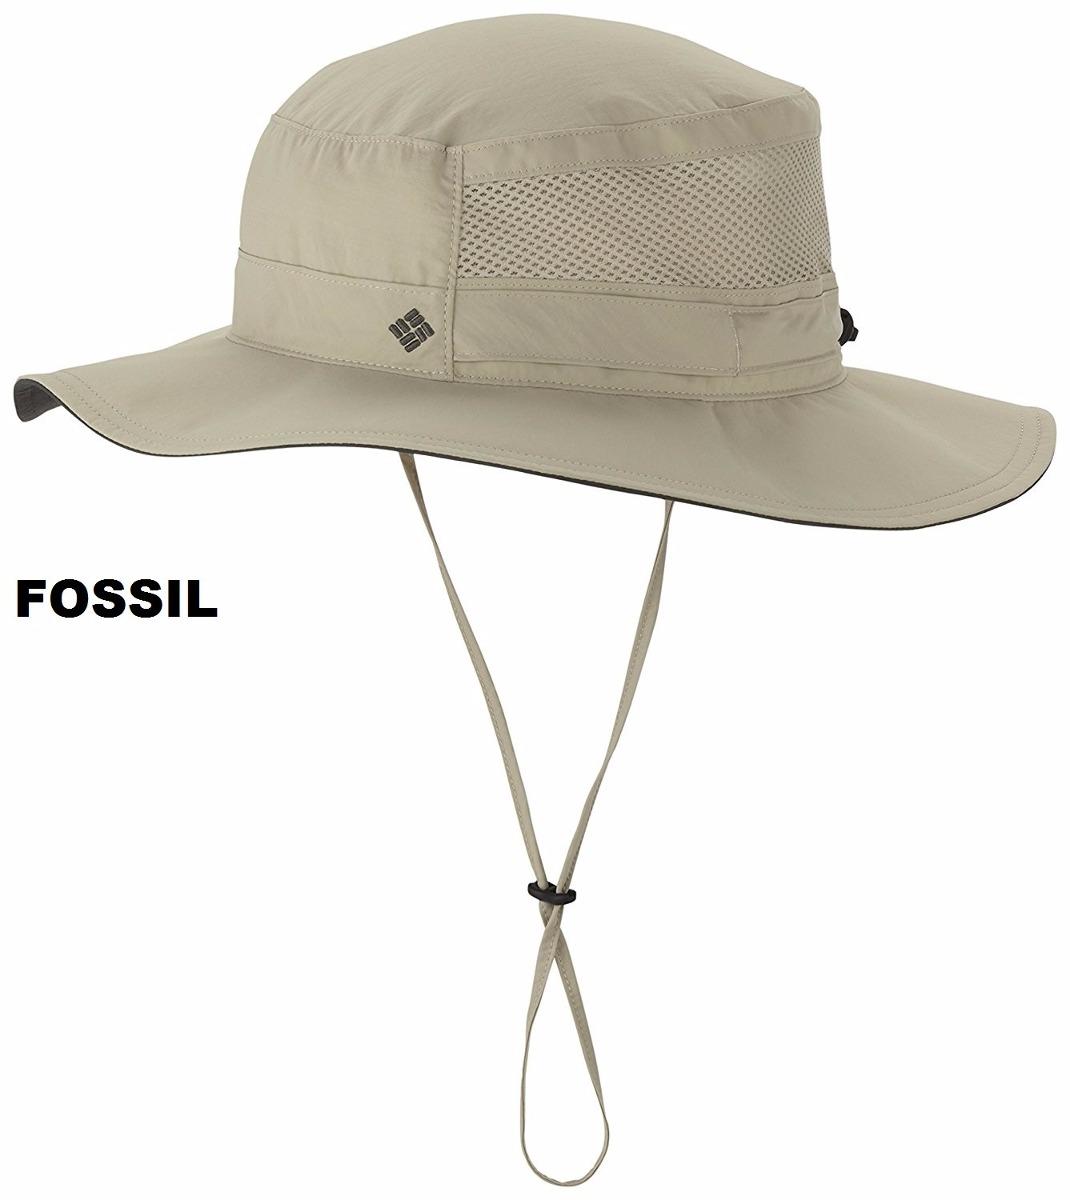 sombrero-columbia-sportswear-bora-bora-booney-ii-sun-hats-D_NQ_NP_722327-MCO25760565530_072017-F